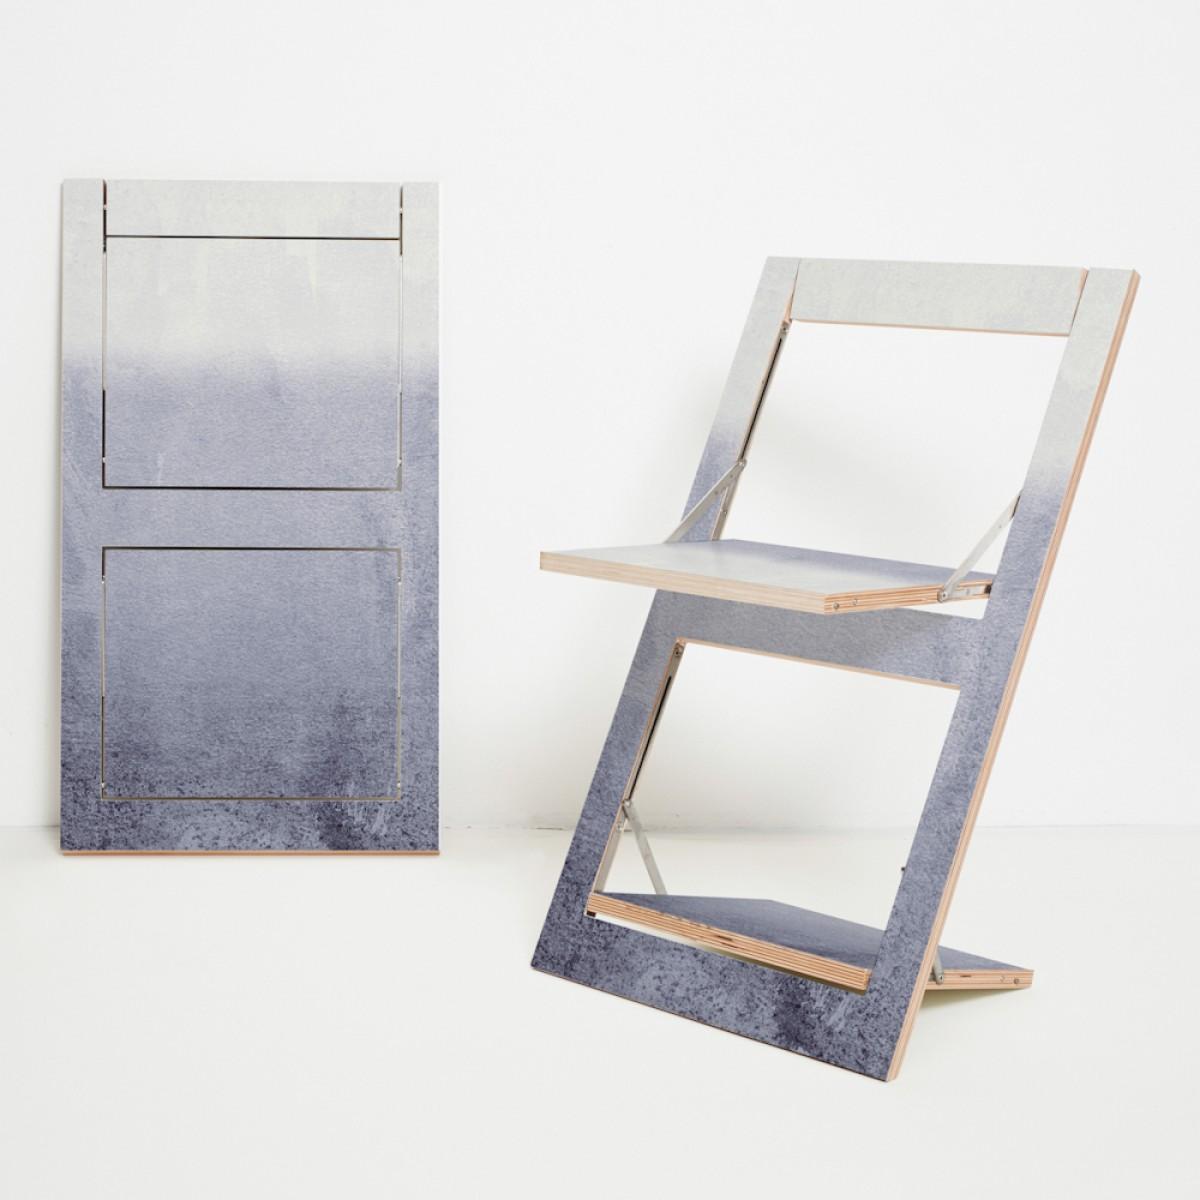 Ambivalenz Fläpps Klappstuhl – Fading Grey by Monika Strigel